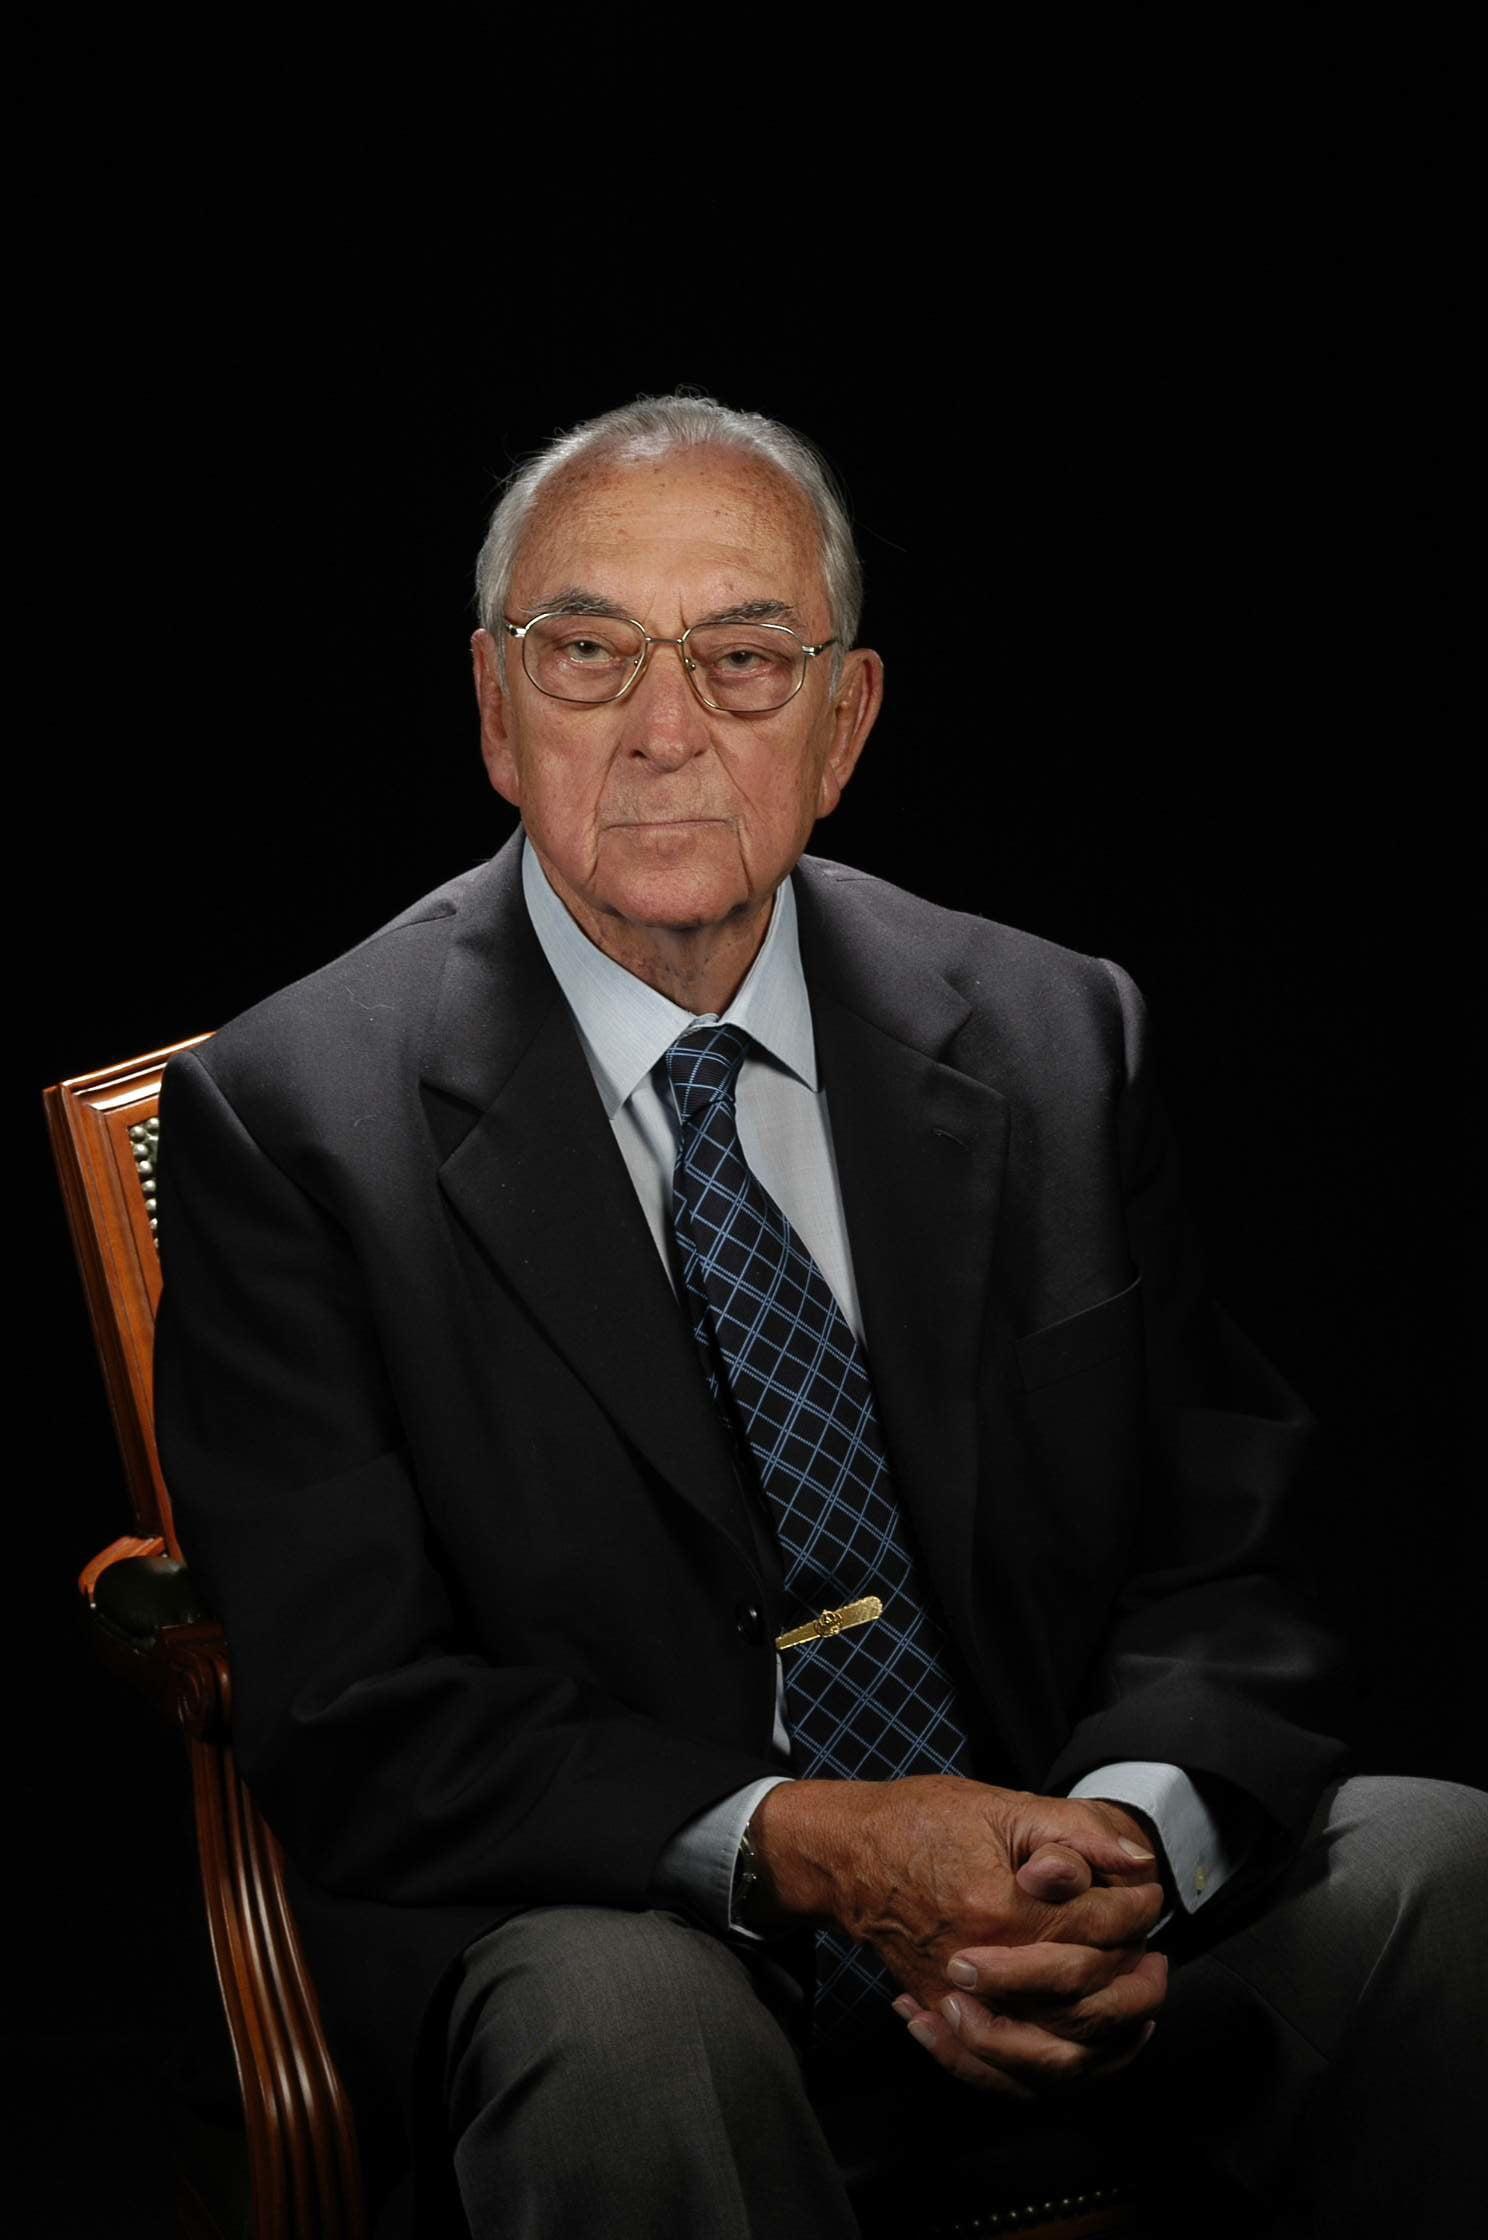 Dr. Alfredo Muiños Simón